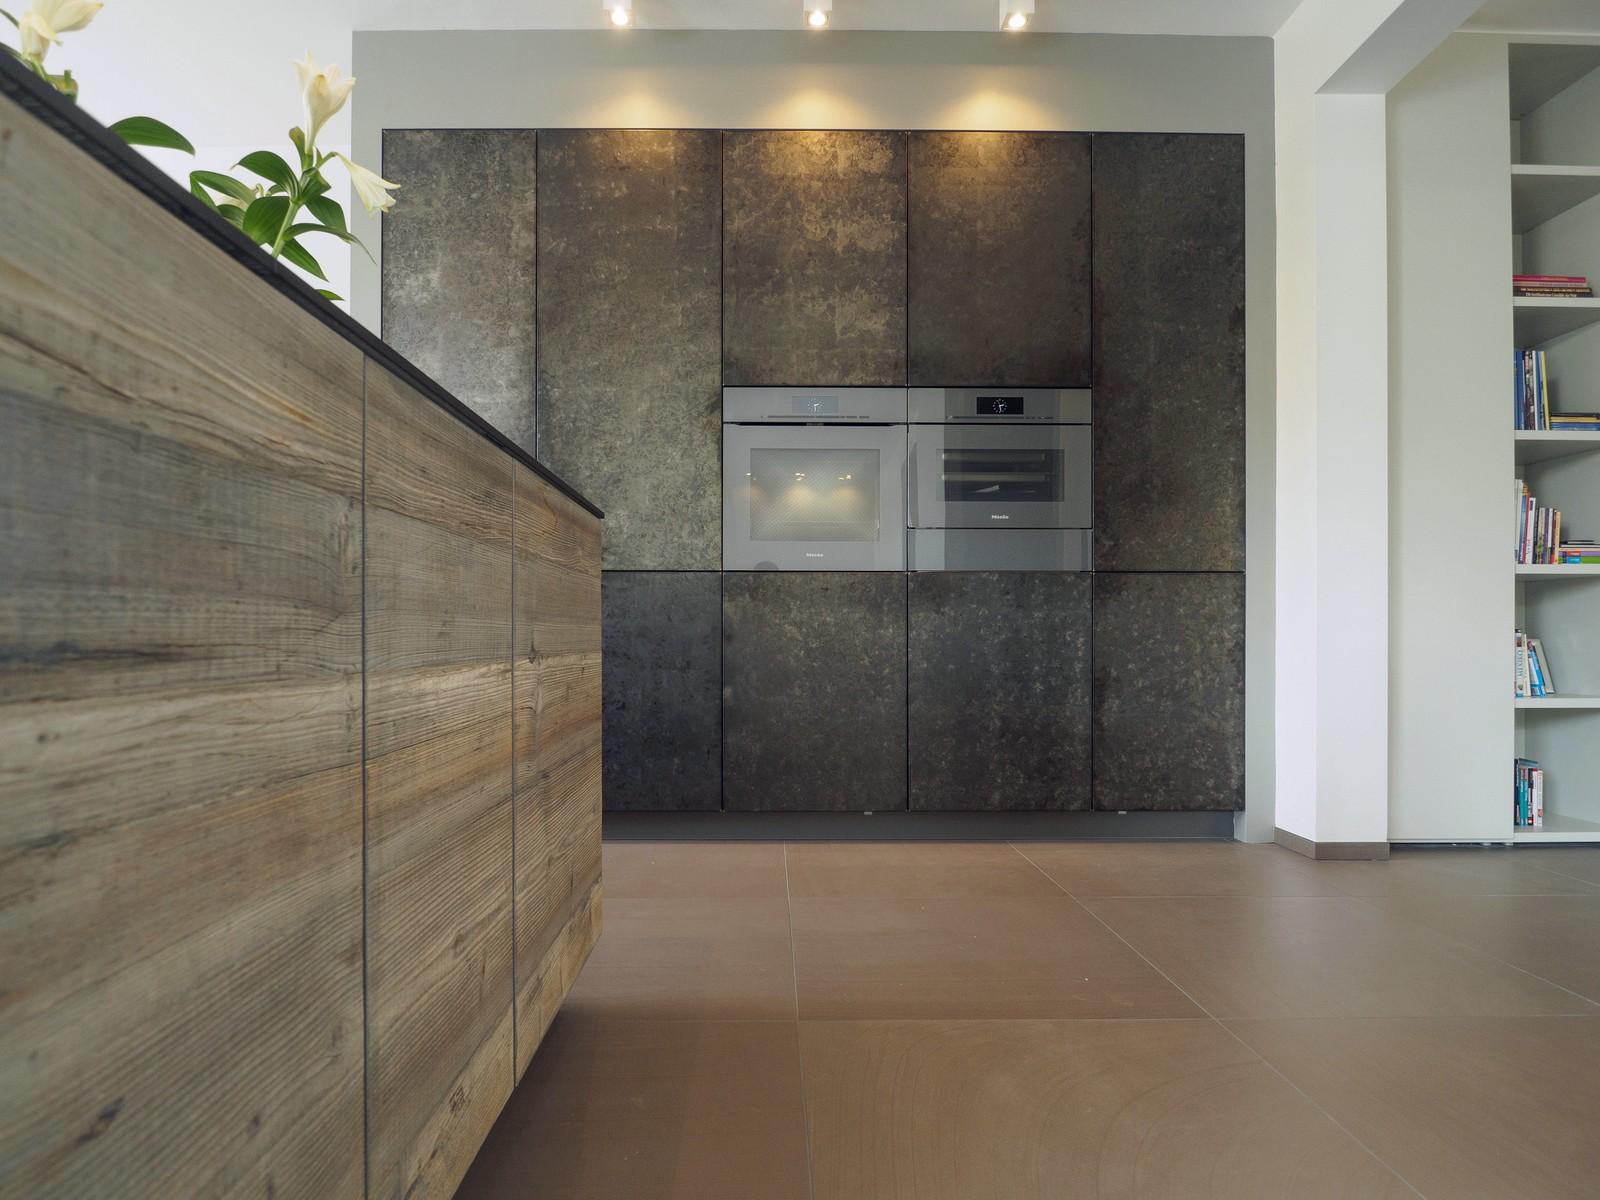 Kueche Exklusiv Design Fronten Holz Furnier Sonnenverbrannt Stahl Keramik Arbeitsplatte Miele 14